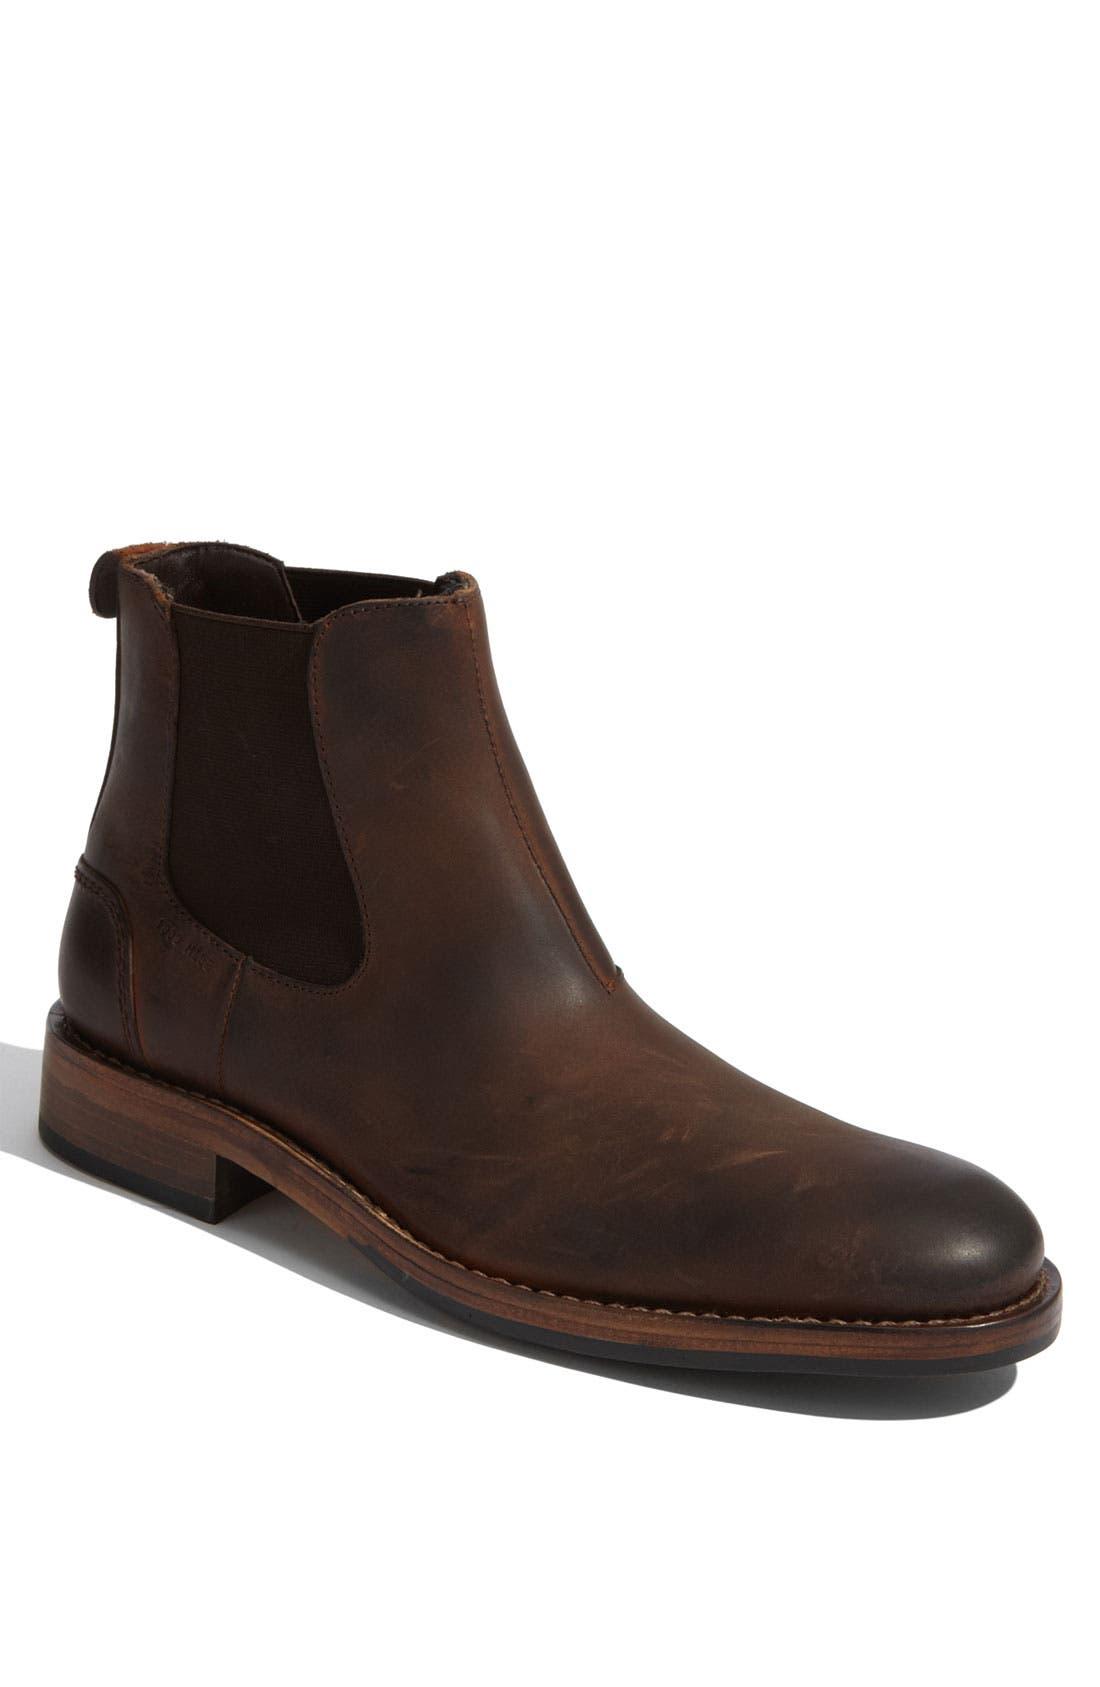 WOLVERINE Montague Chelsea Boot